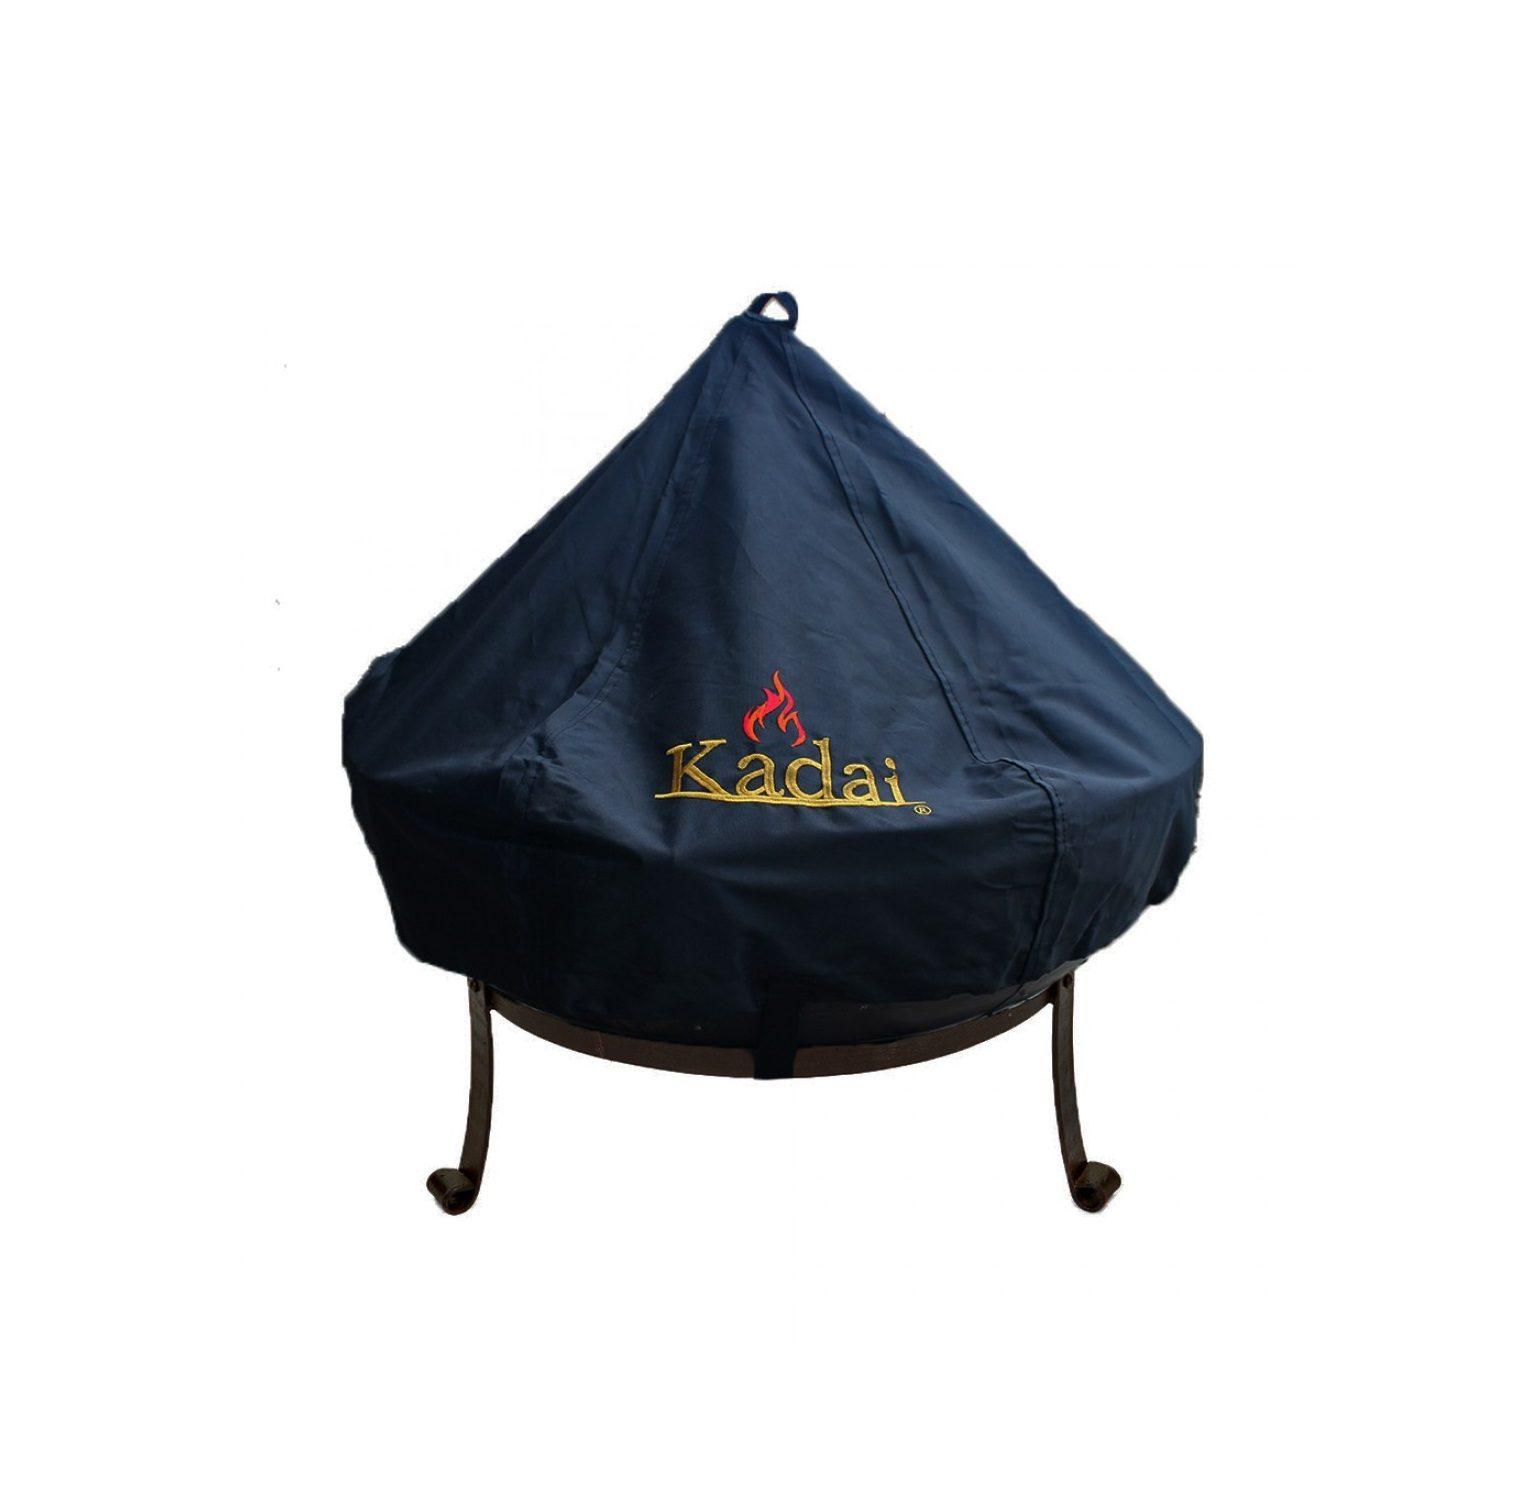 Kadai Cover